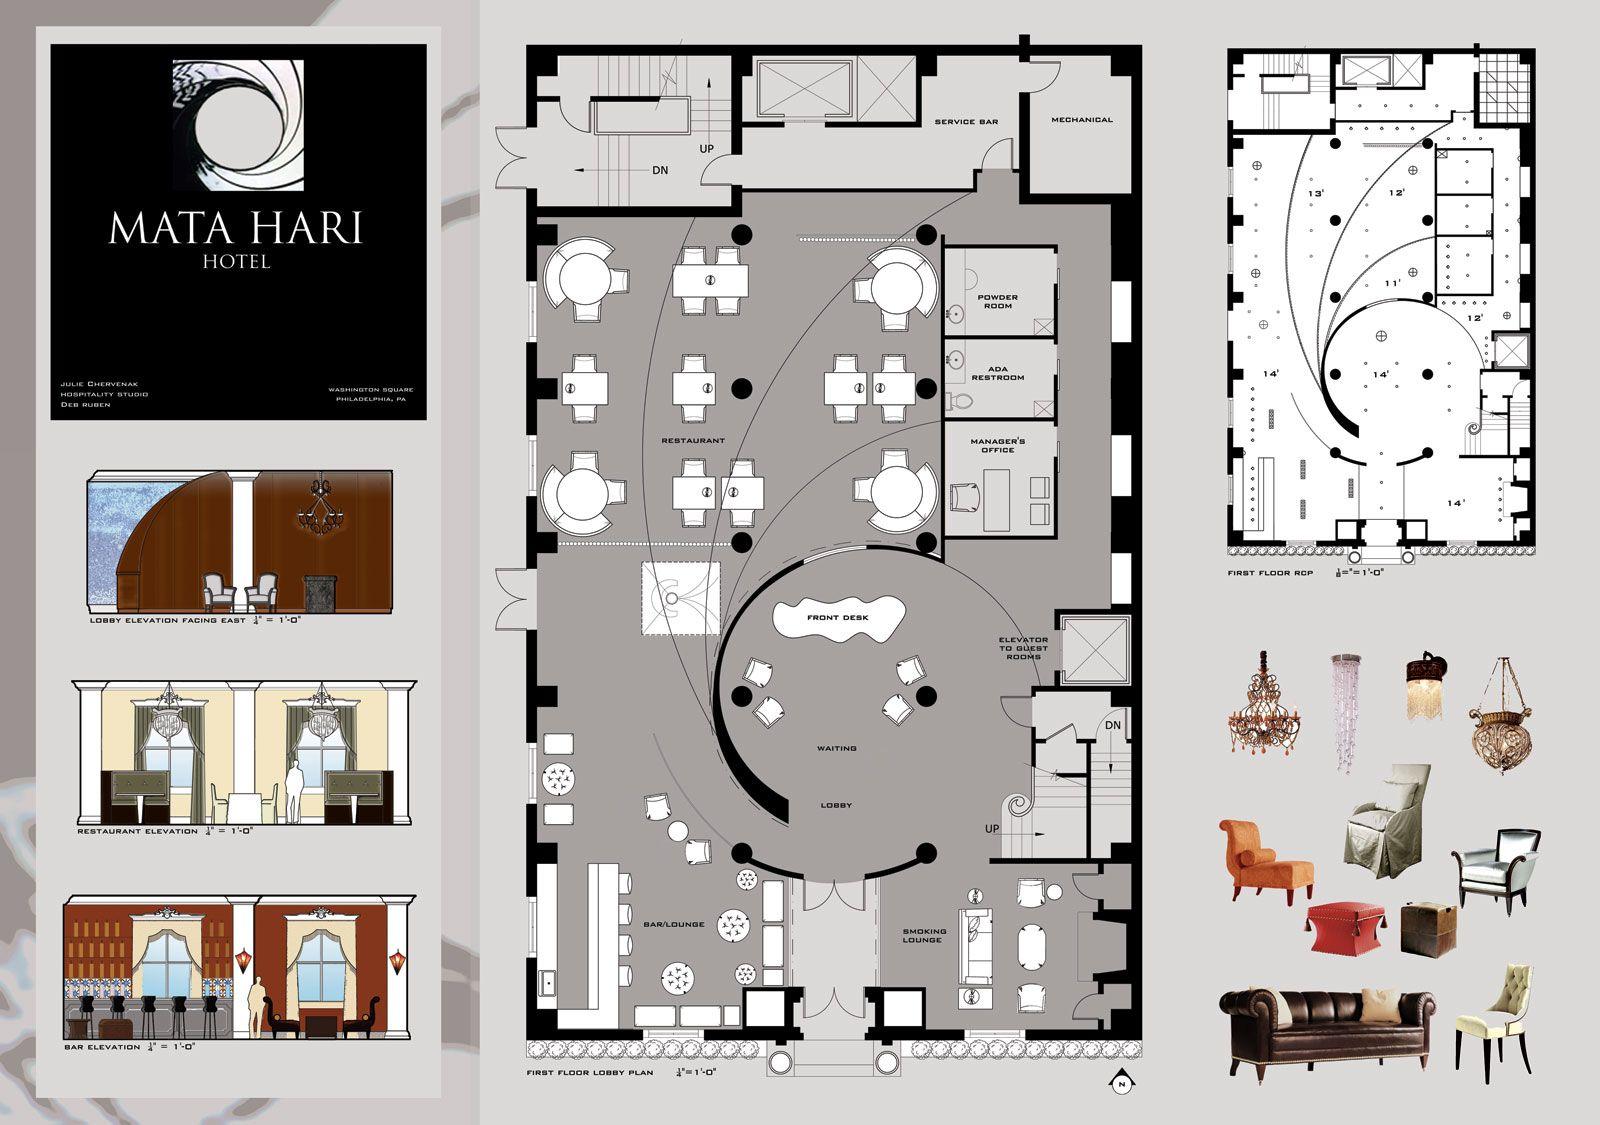 Afficher l 39 image d 39 origine plan pinterest for Origine architecture